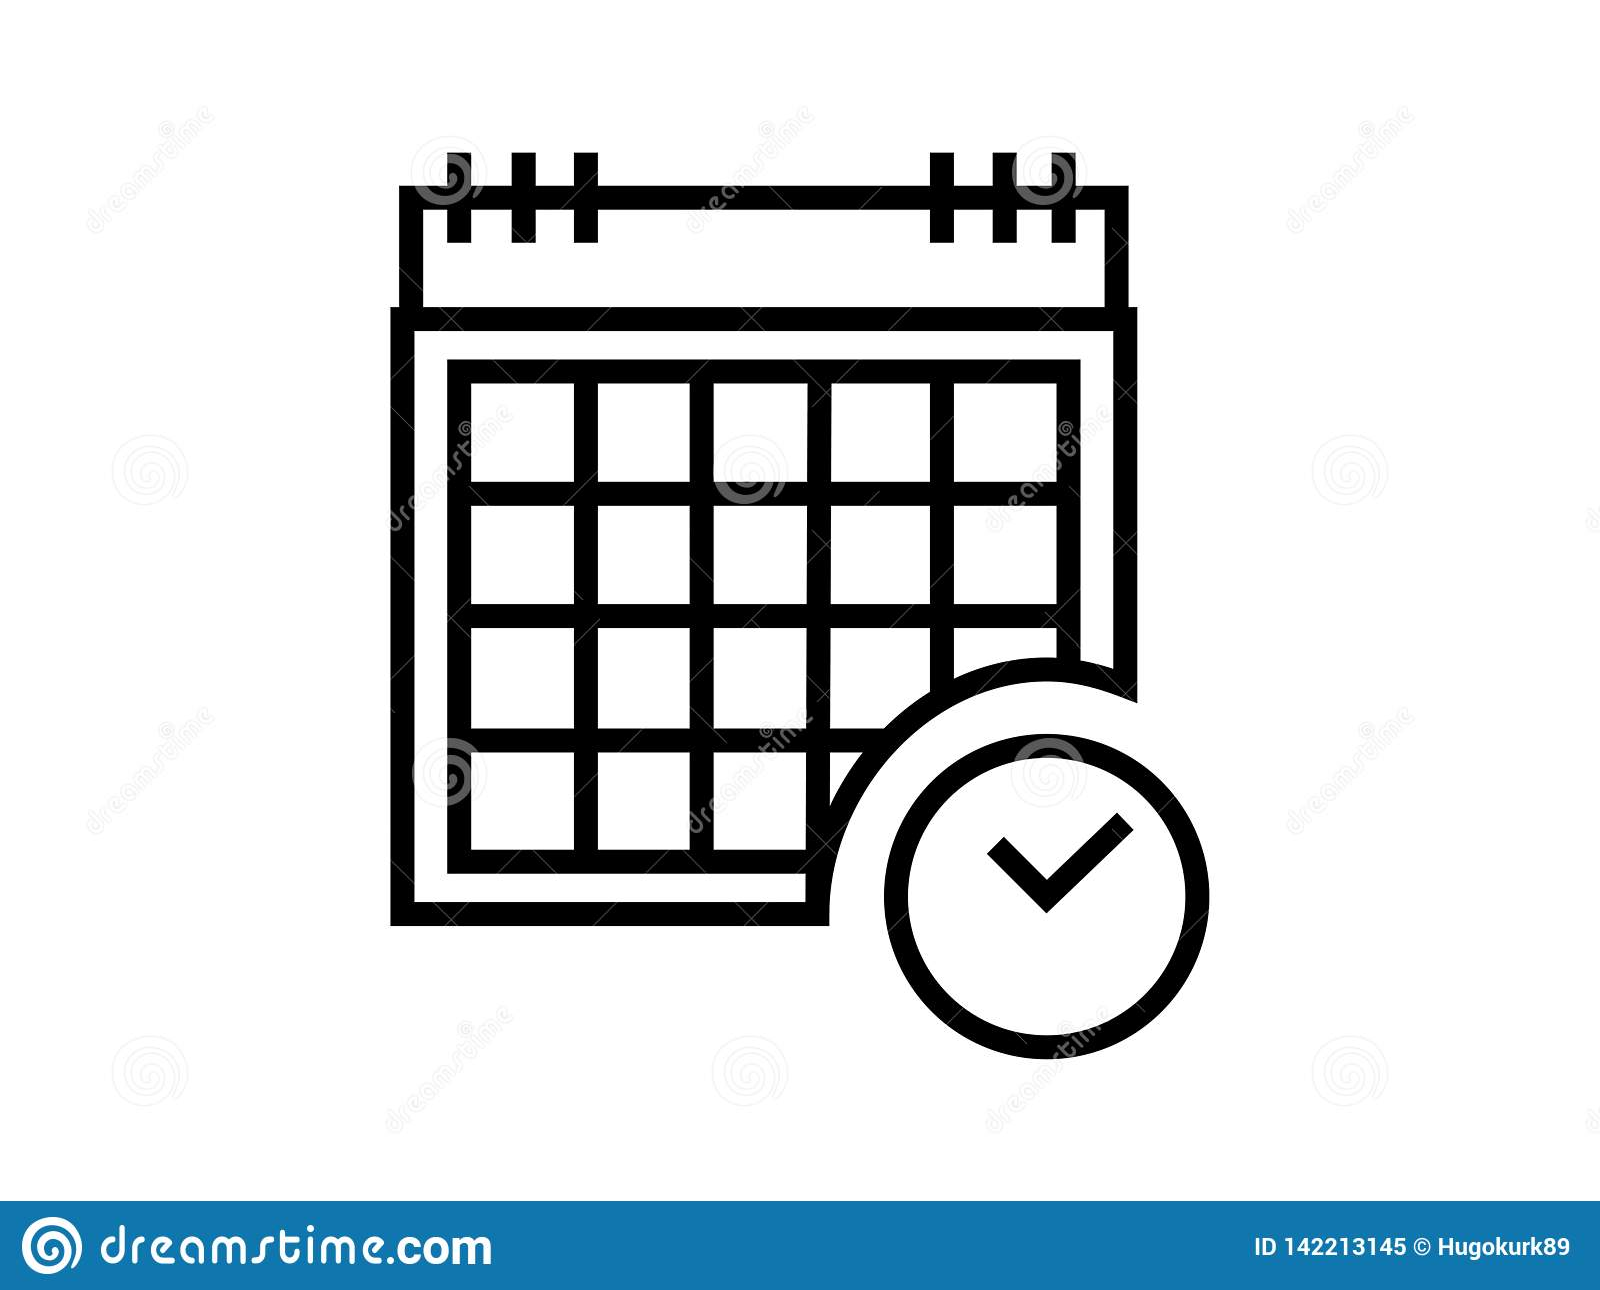 Illustration Calendrier.Simple Calendar Symbol Illustration Vector On White